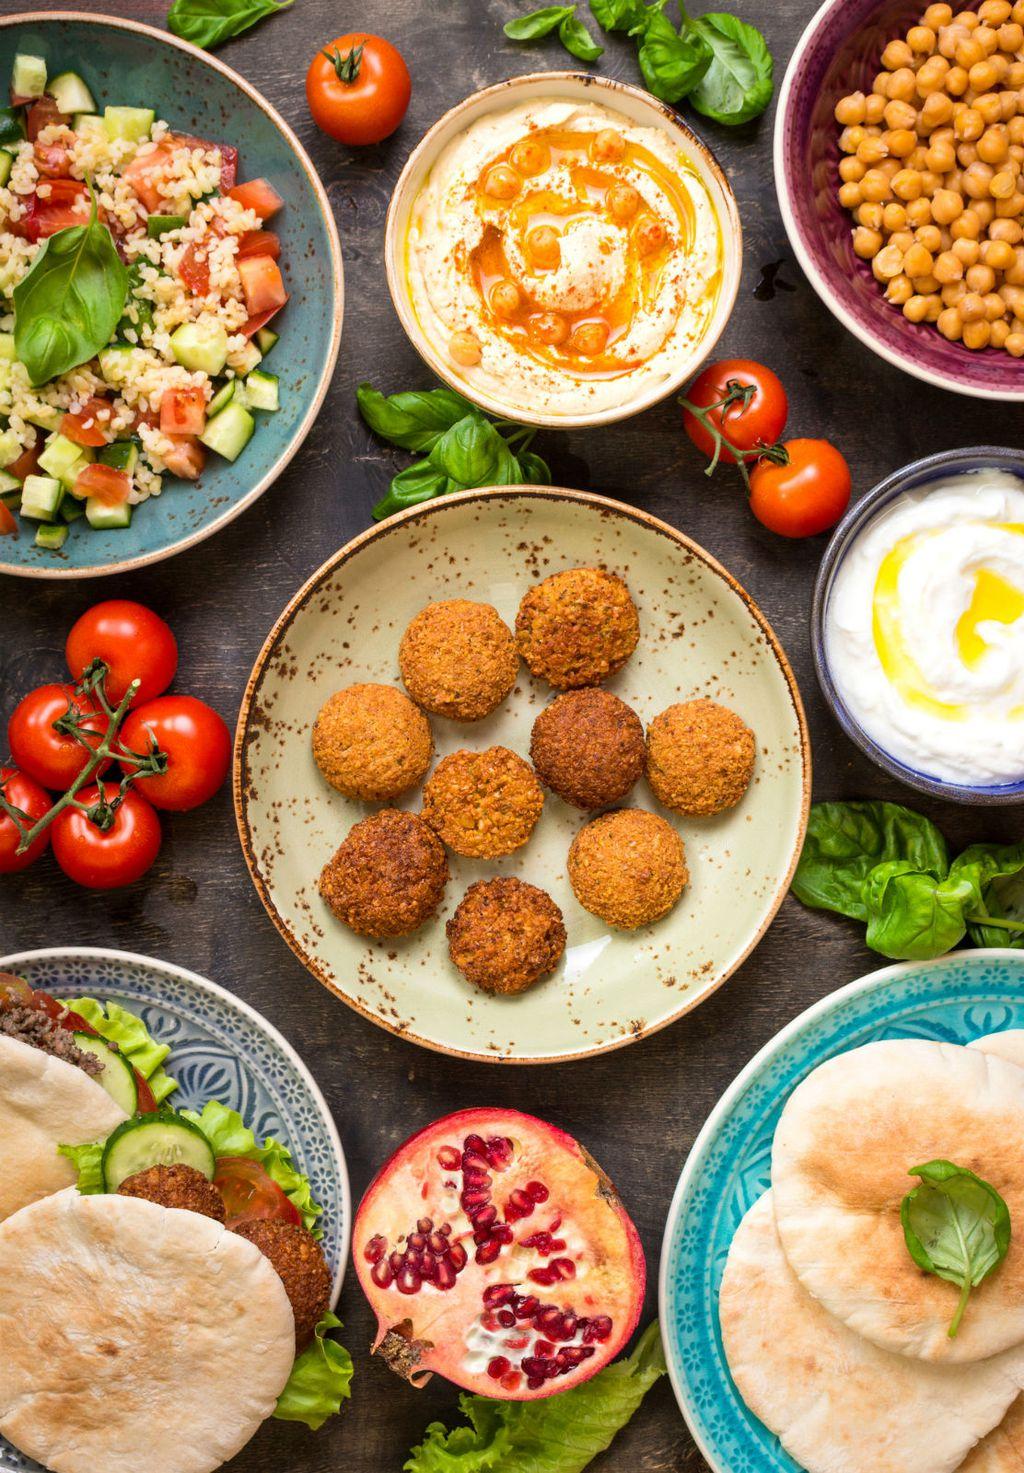 Falafel sadrže mnogo bjelančevina